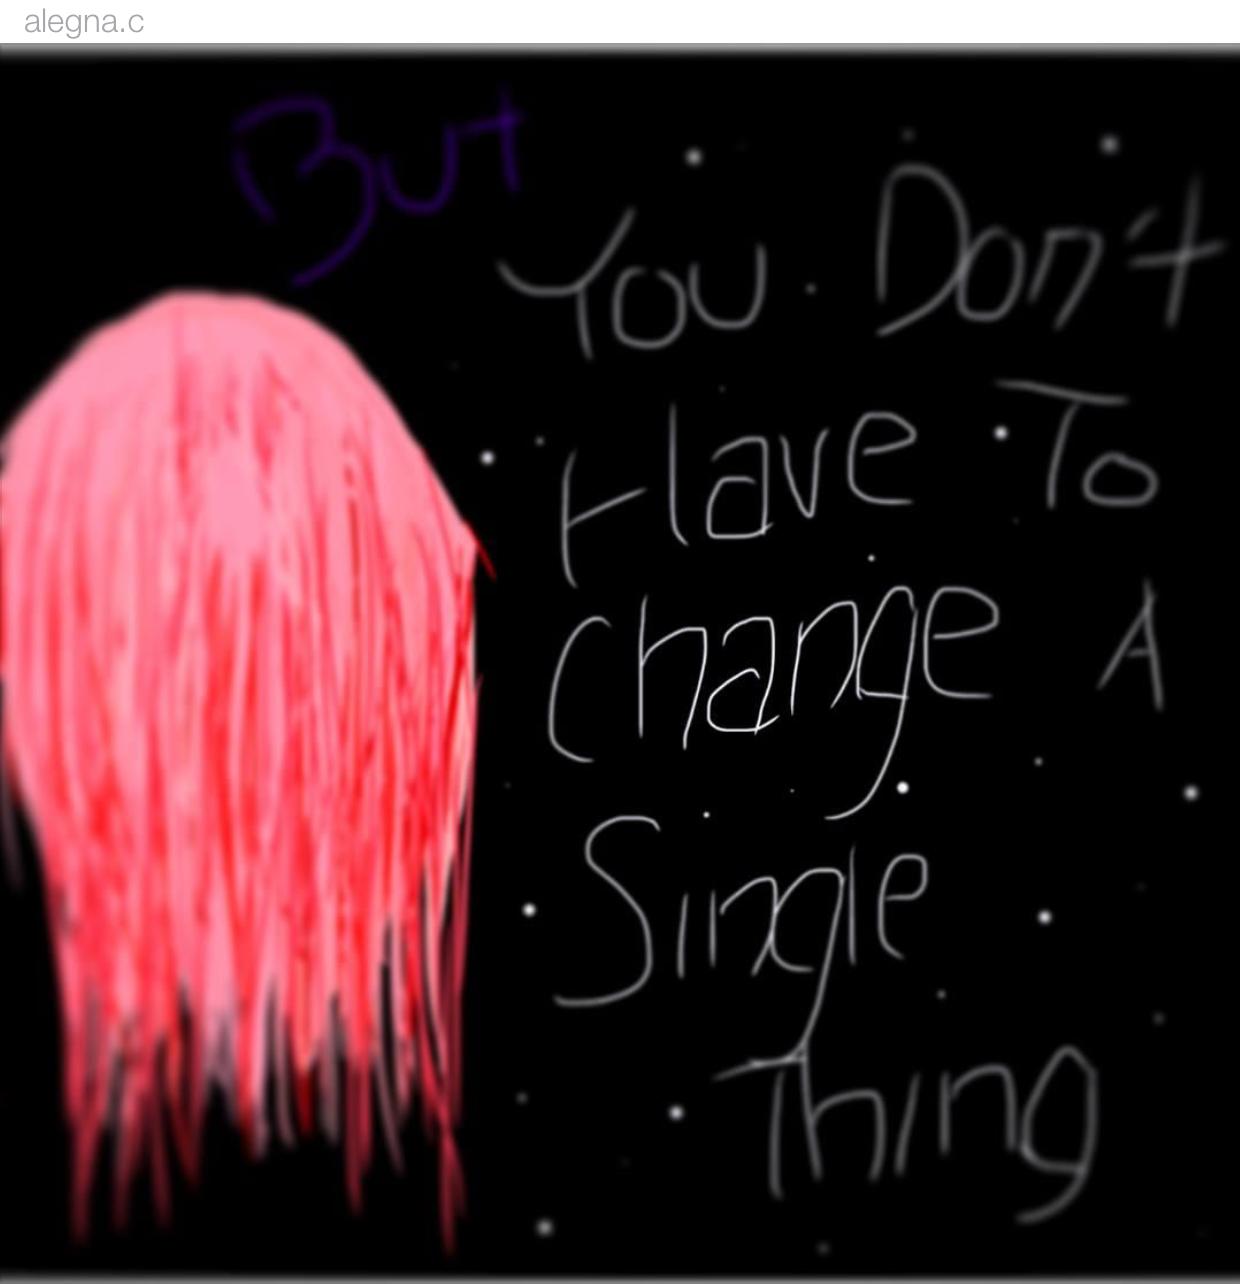 """Ponder"" by @alenga.c"